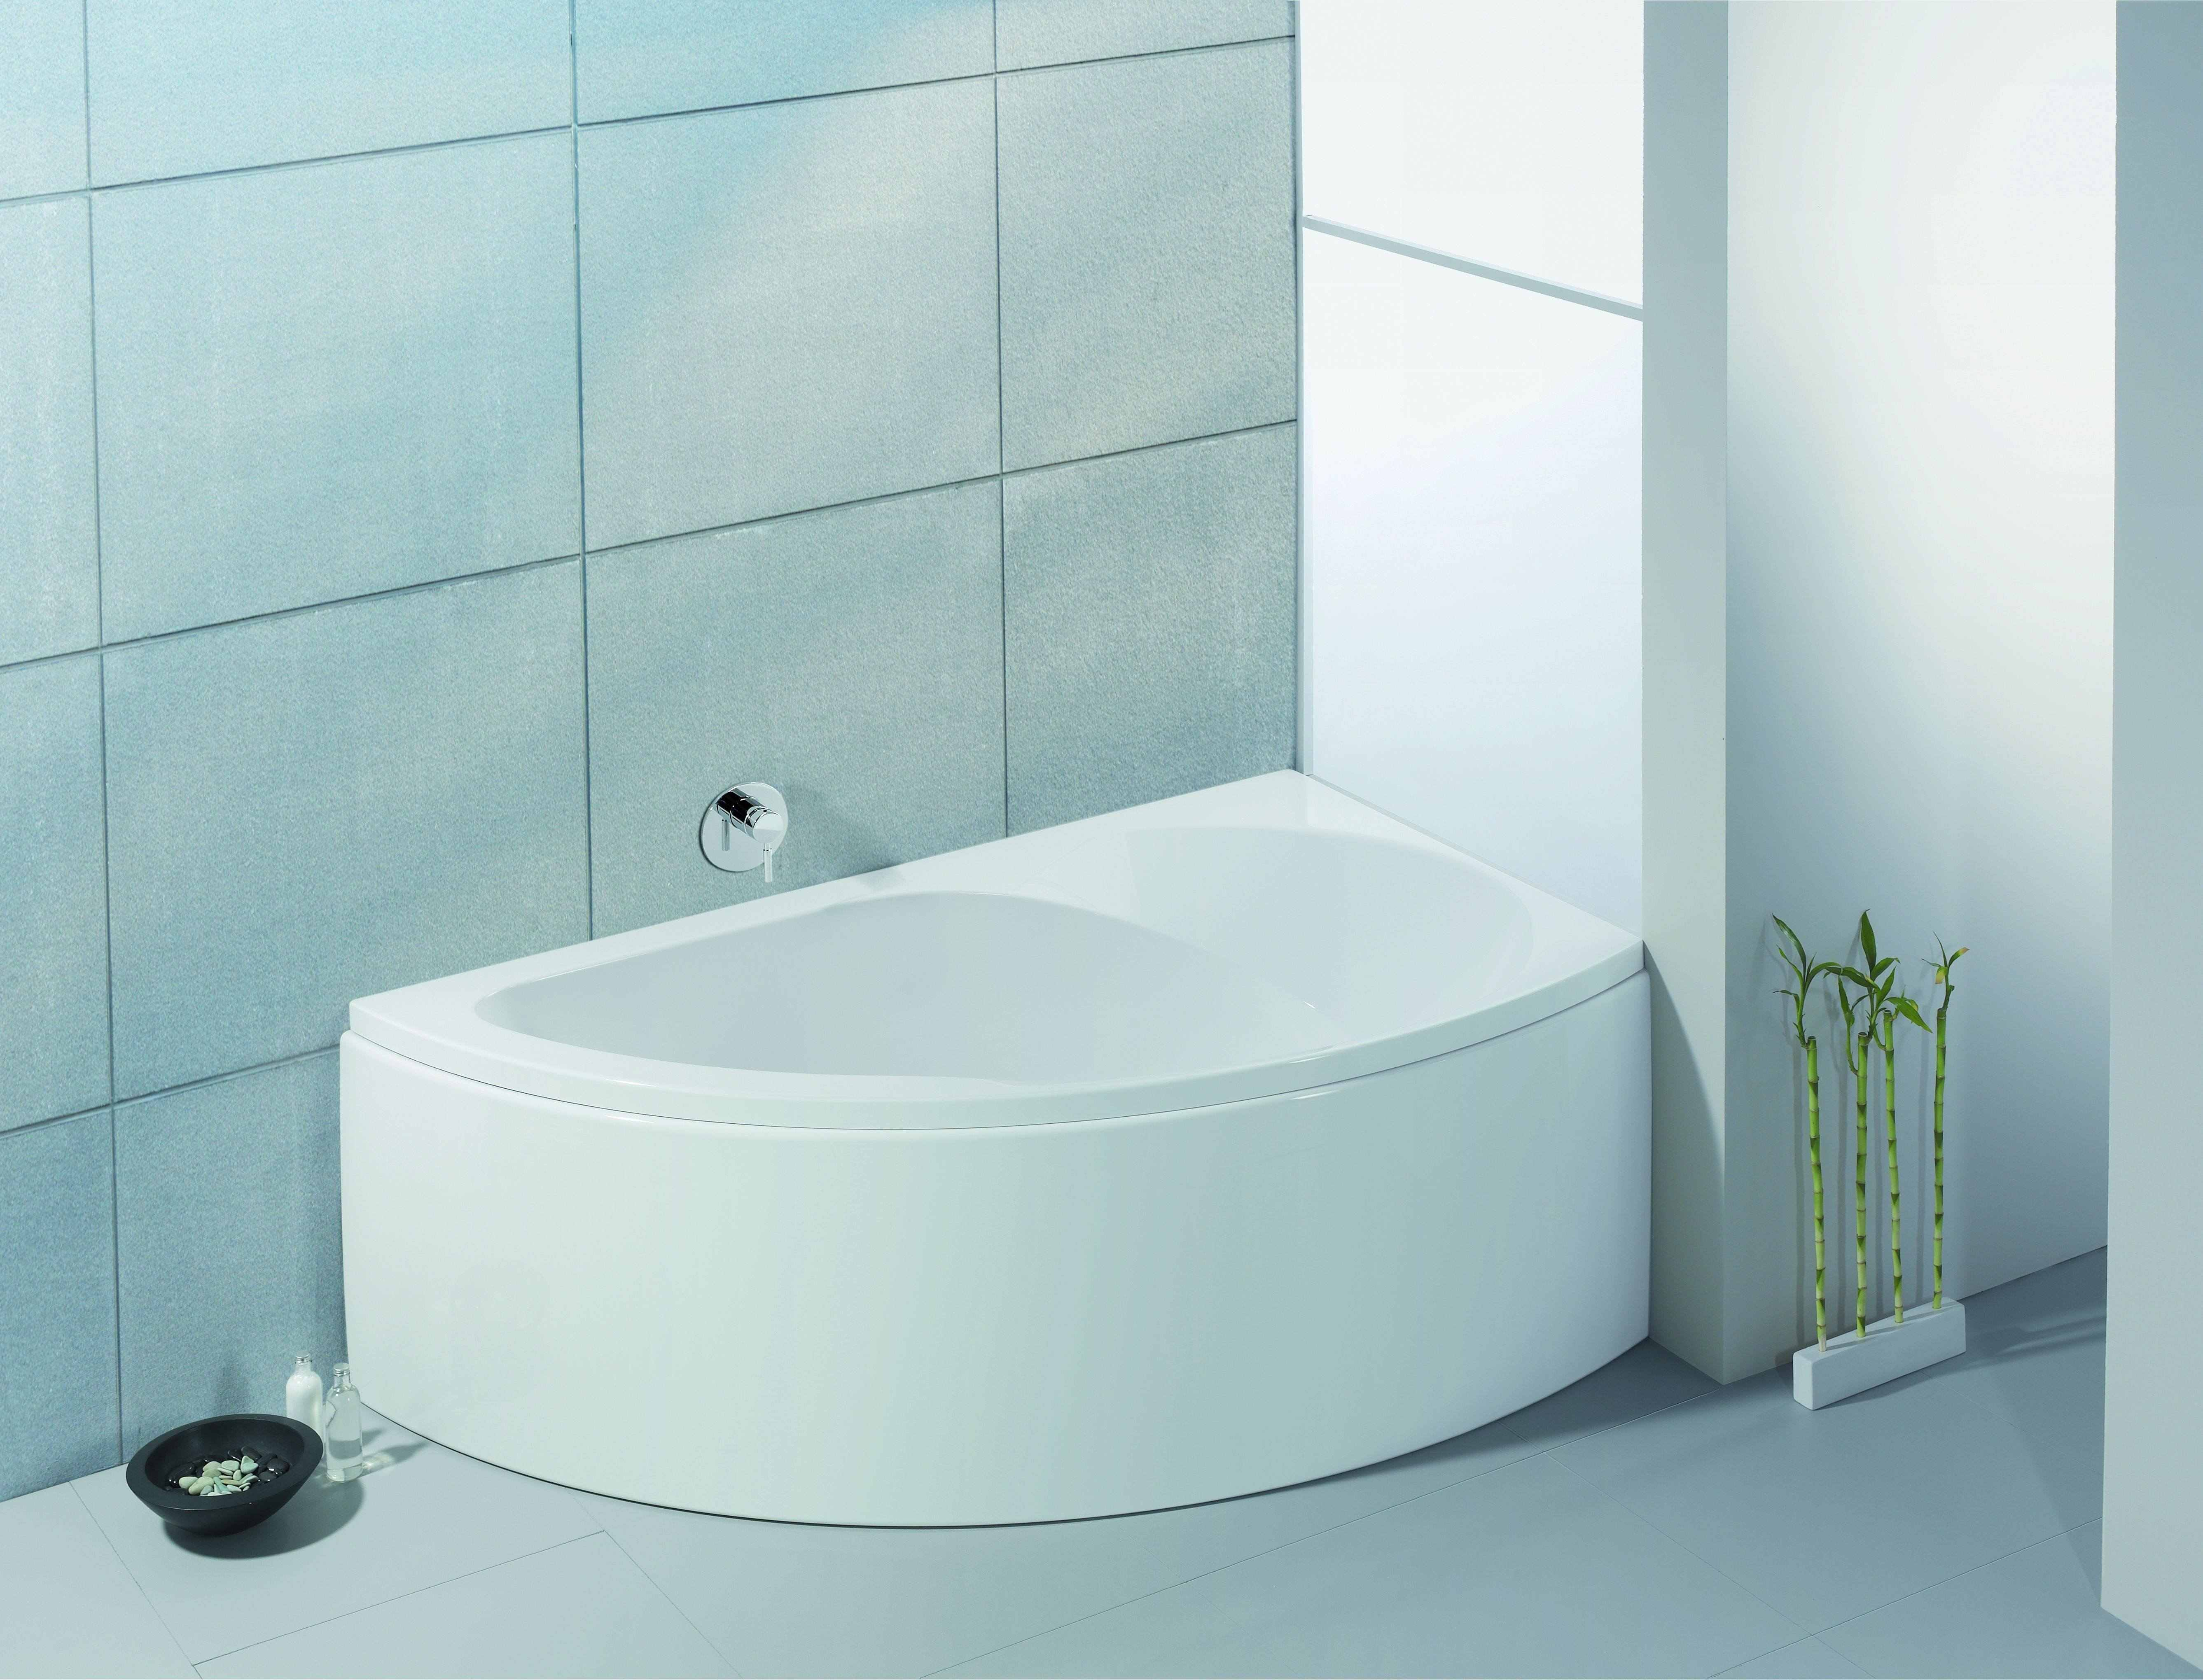 hoesch spectra eckbadewanne 1718 x 1014 mm rechts mit. Black Bedroom Furniture Sets. Home Design Ideas